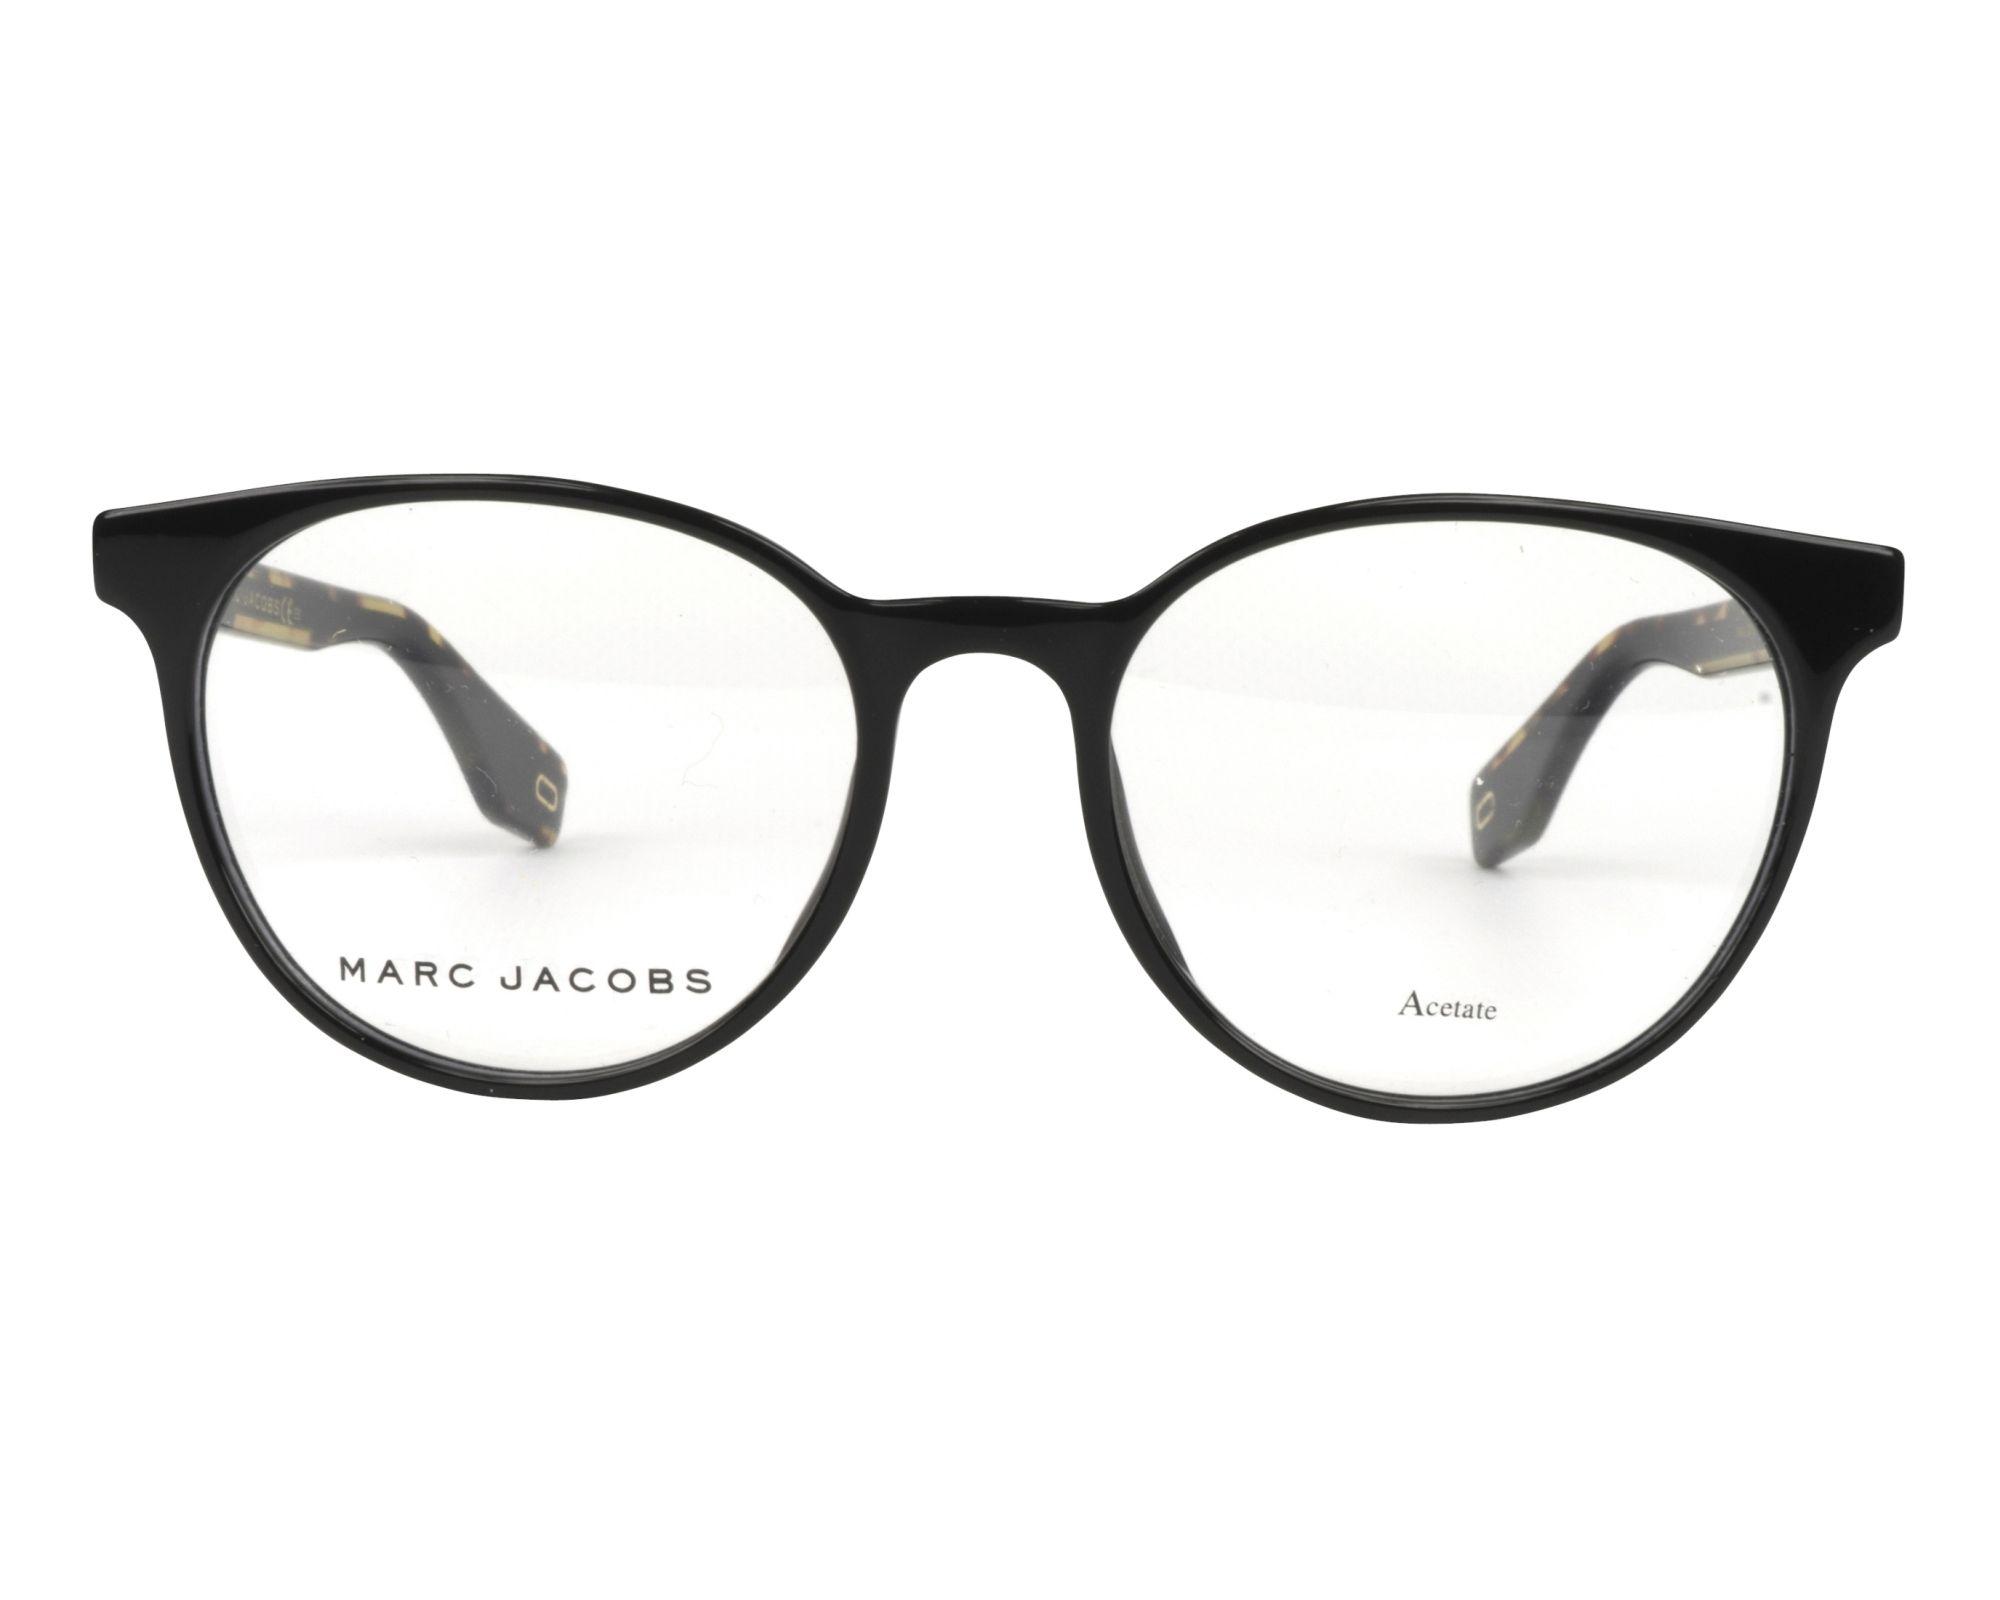 b916502618f eyeglasses Marc Jacobs MARC-283 807 52-18 Black Brown front view